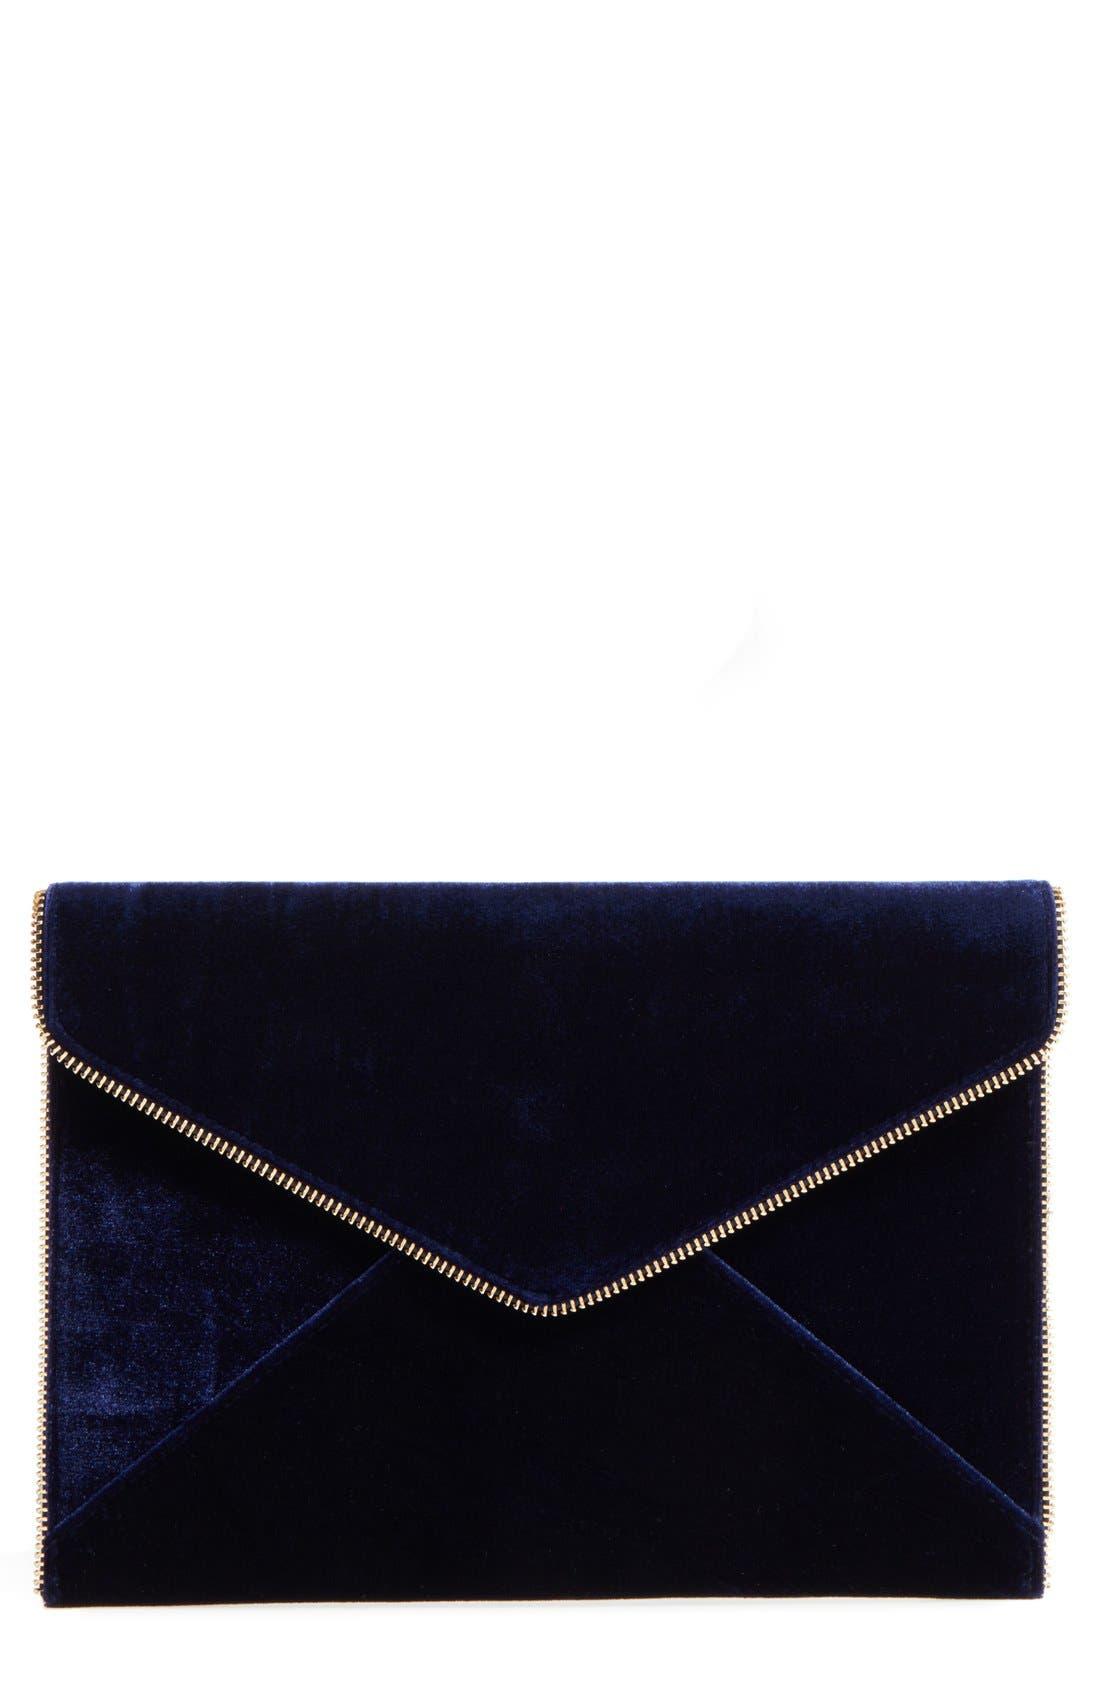 Alternate Image 1 Selected - Rebecca Minkoff Leo Velvet Envelope Clutch